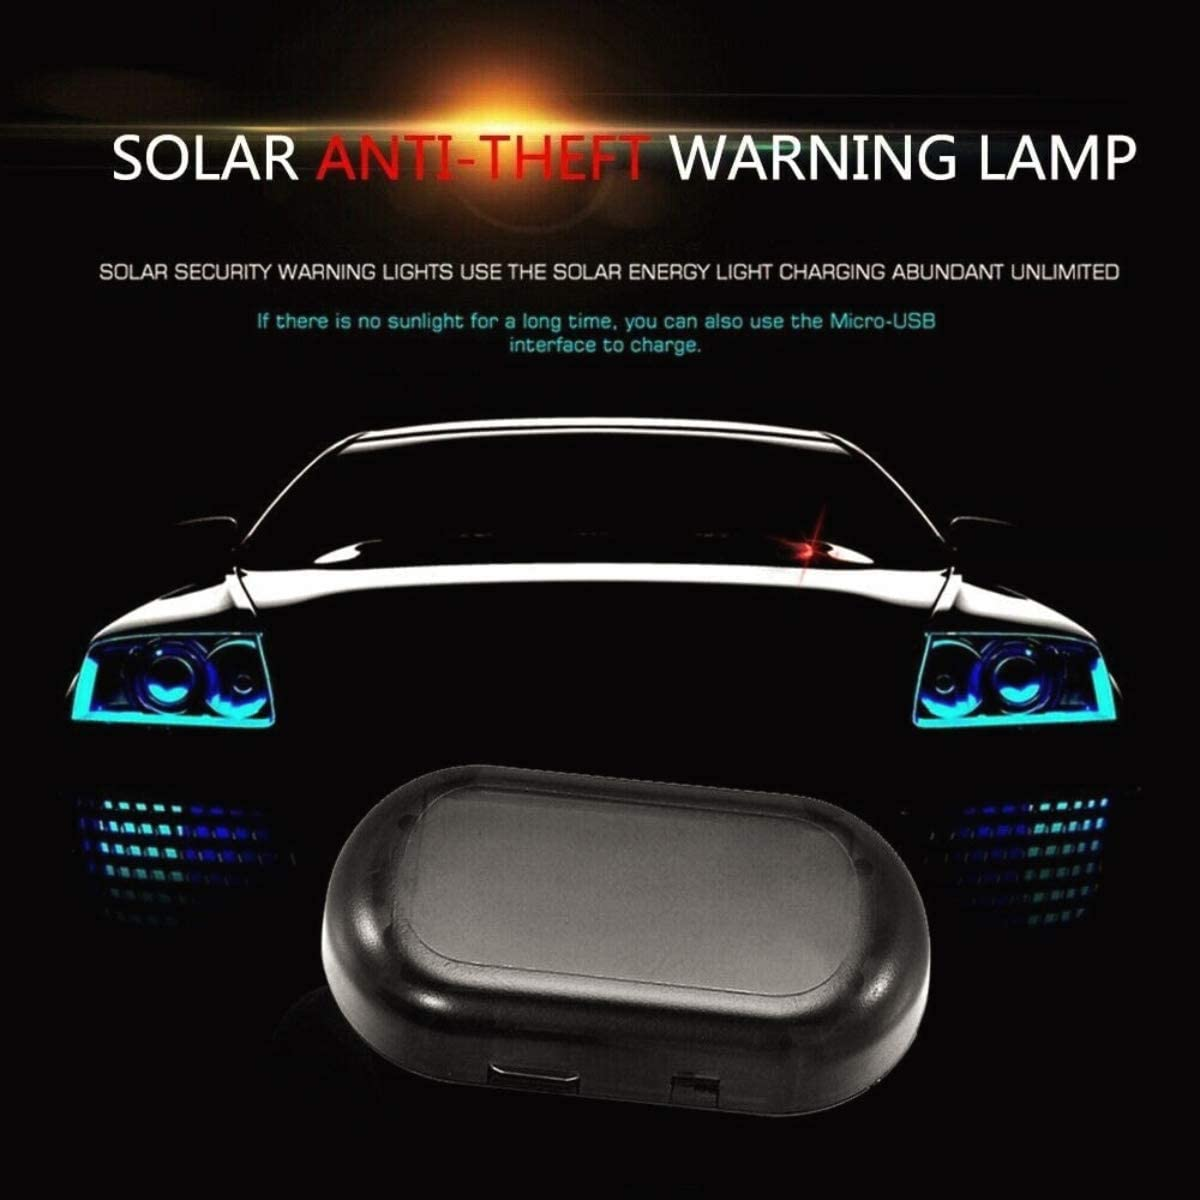 Car Alarm Light Car Solar Power Simulated Dummy Alarm Warning Anti-Theft LED Flashing Security Light with New USB Port, Blue x2